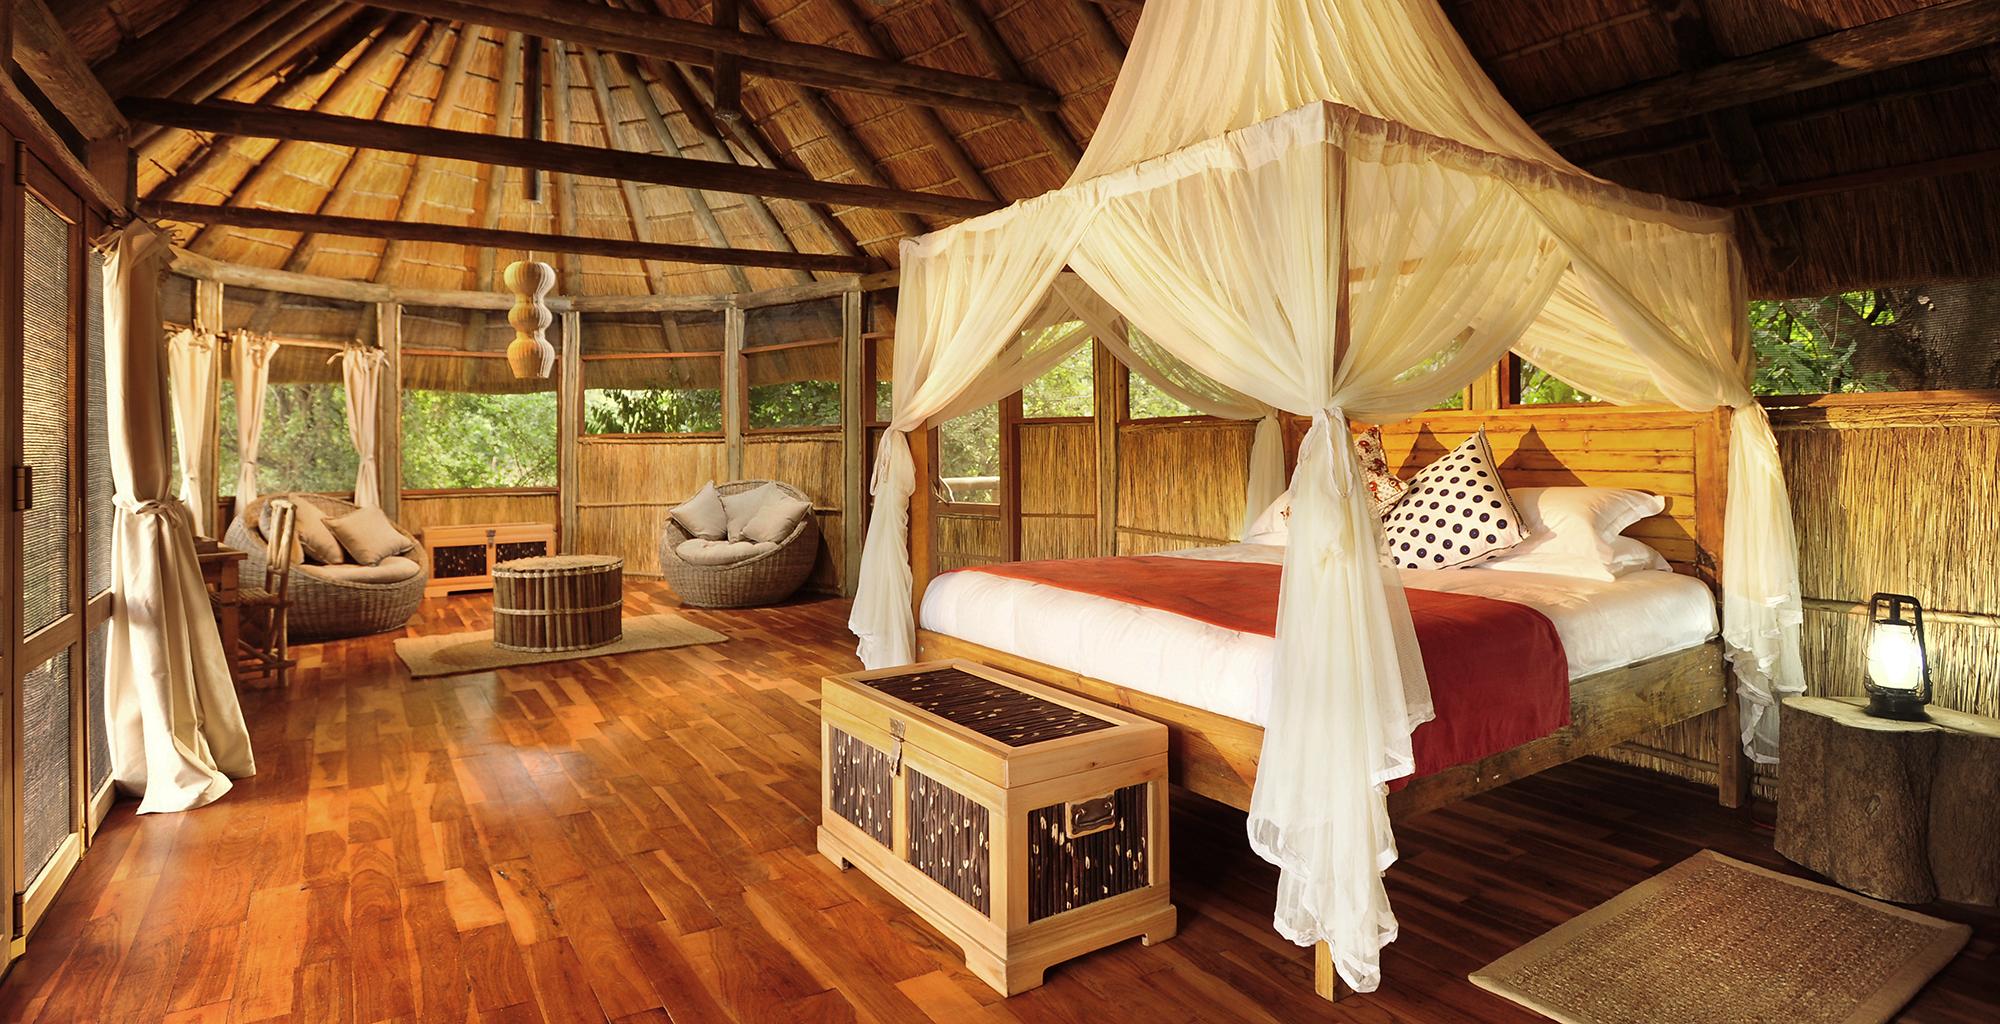 Zambia-Bilimungwe-Bushcamp-Bedroom